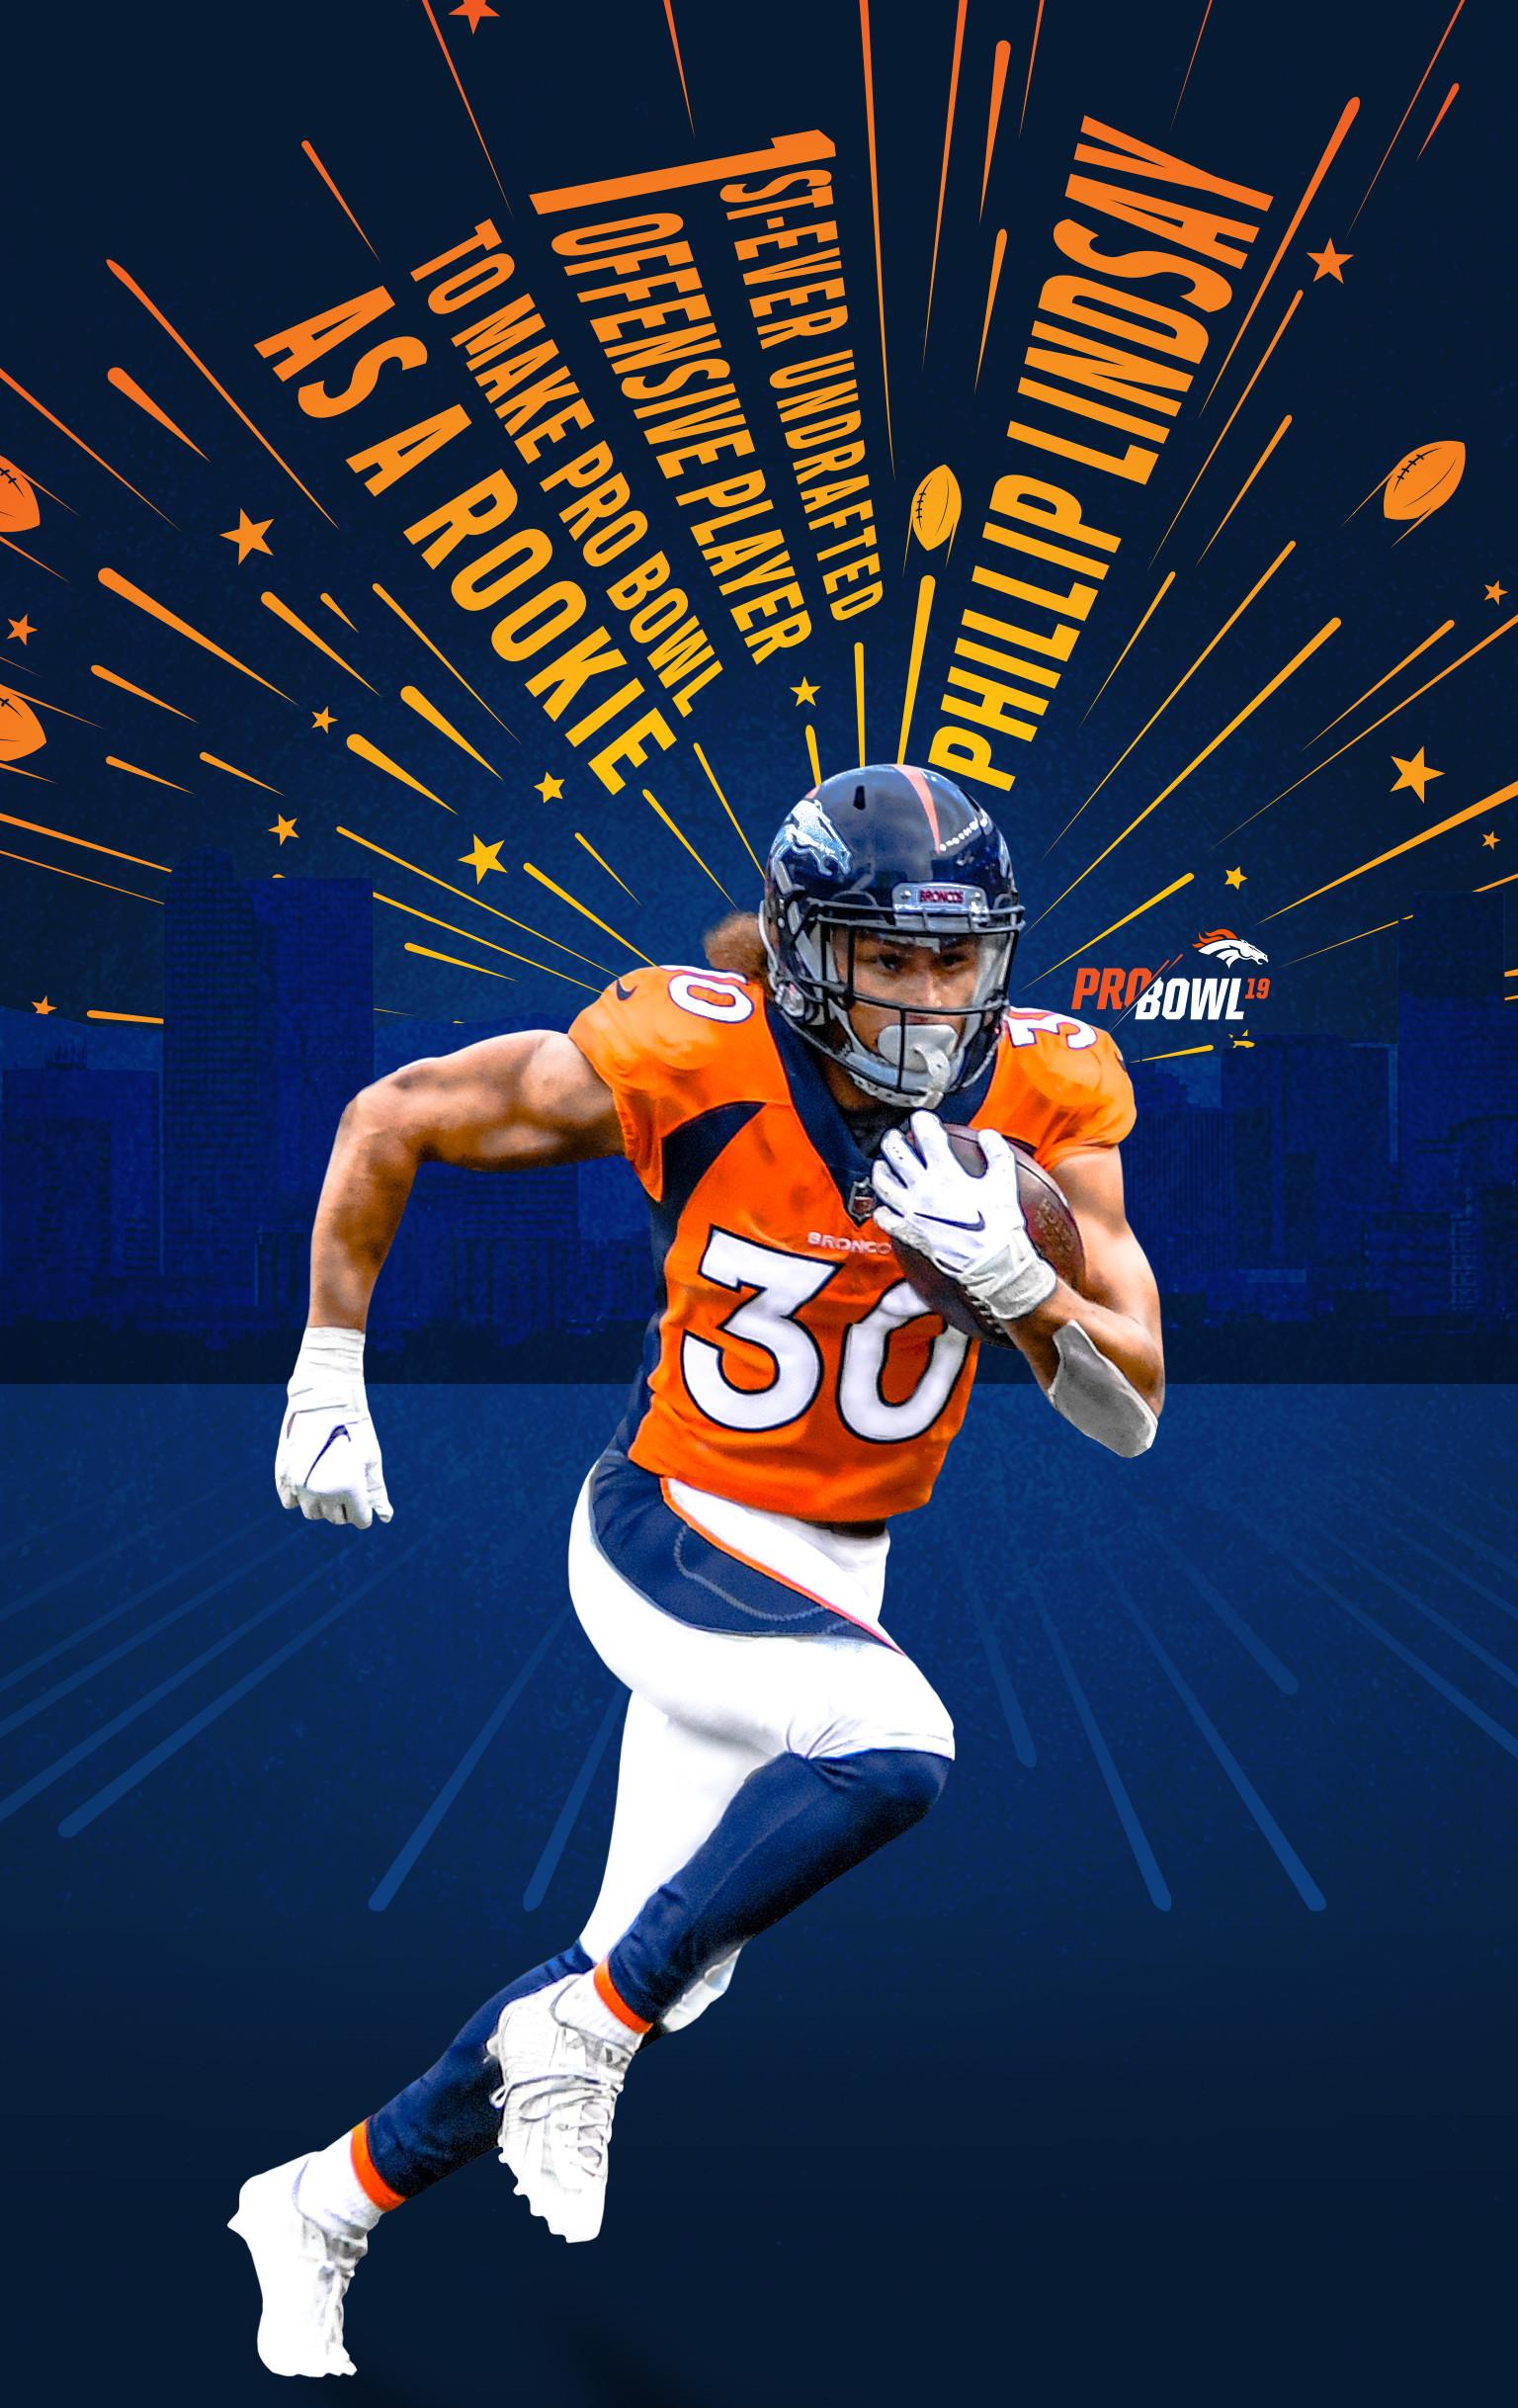 Denver Broncos Wallpaper for Android (78+ images)